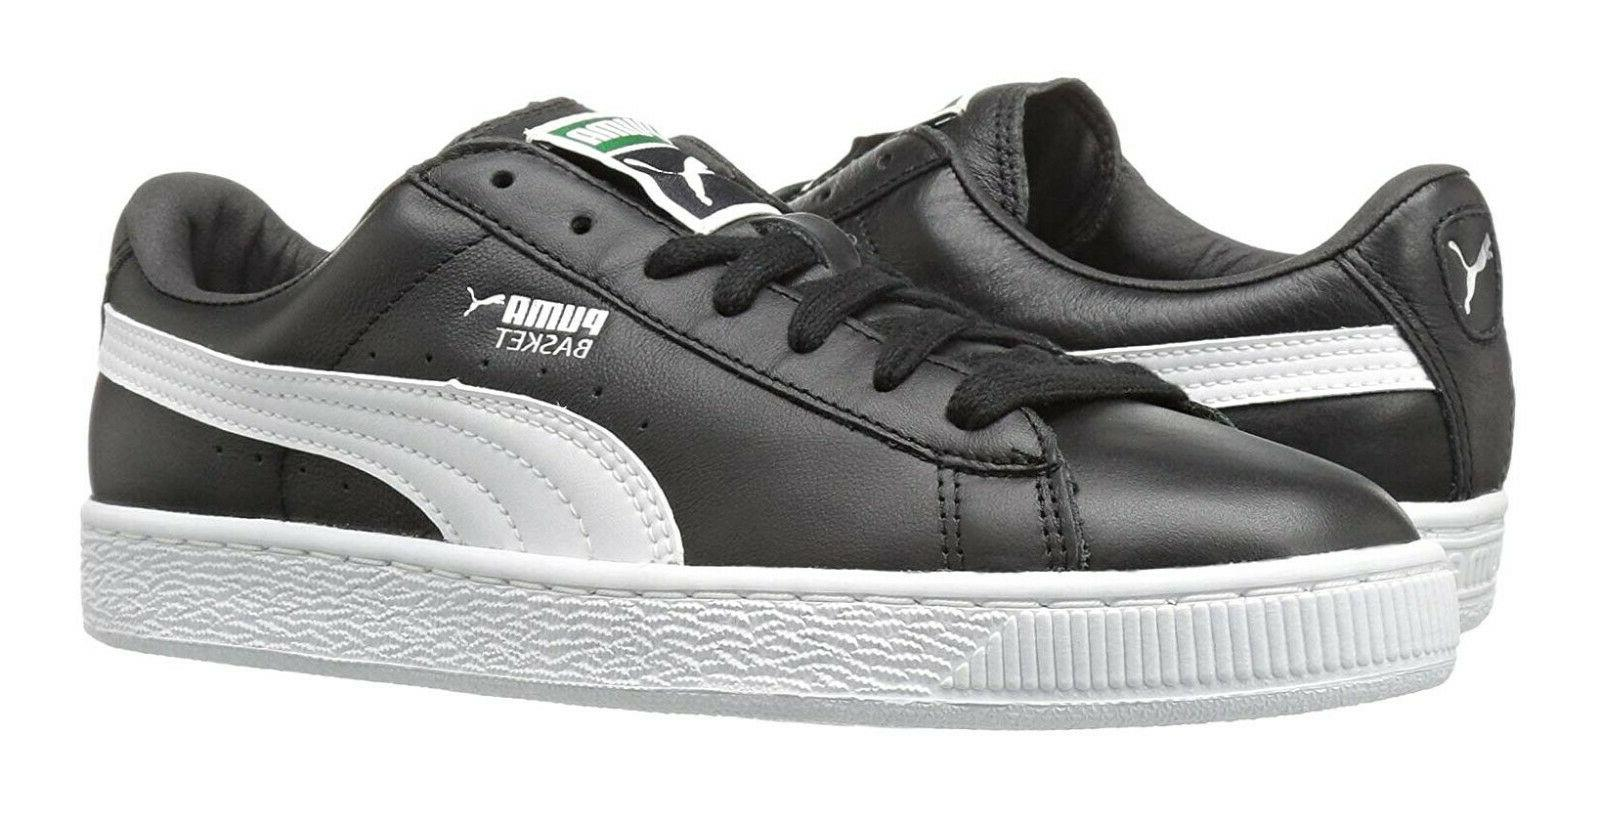 PUMA Basket Classic LFS Black White Mens Sneakers Tennis Shoes 21